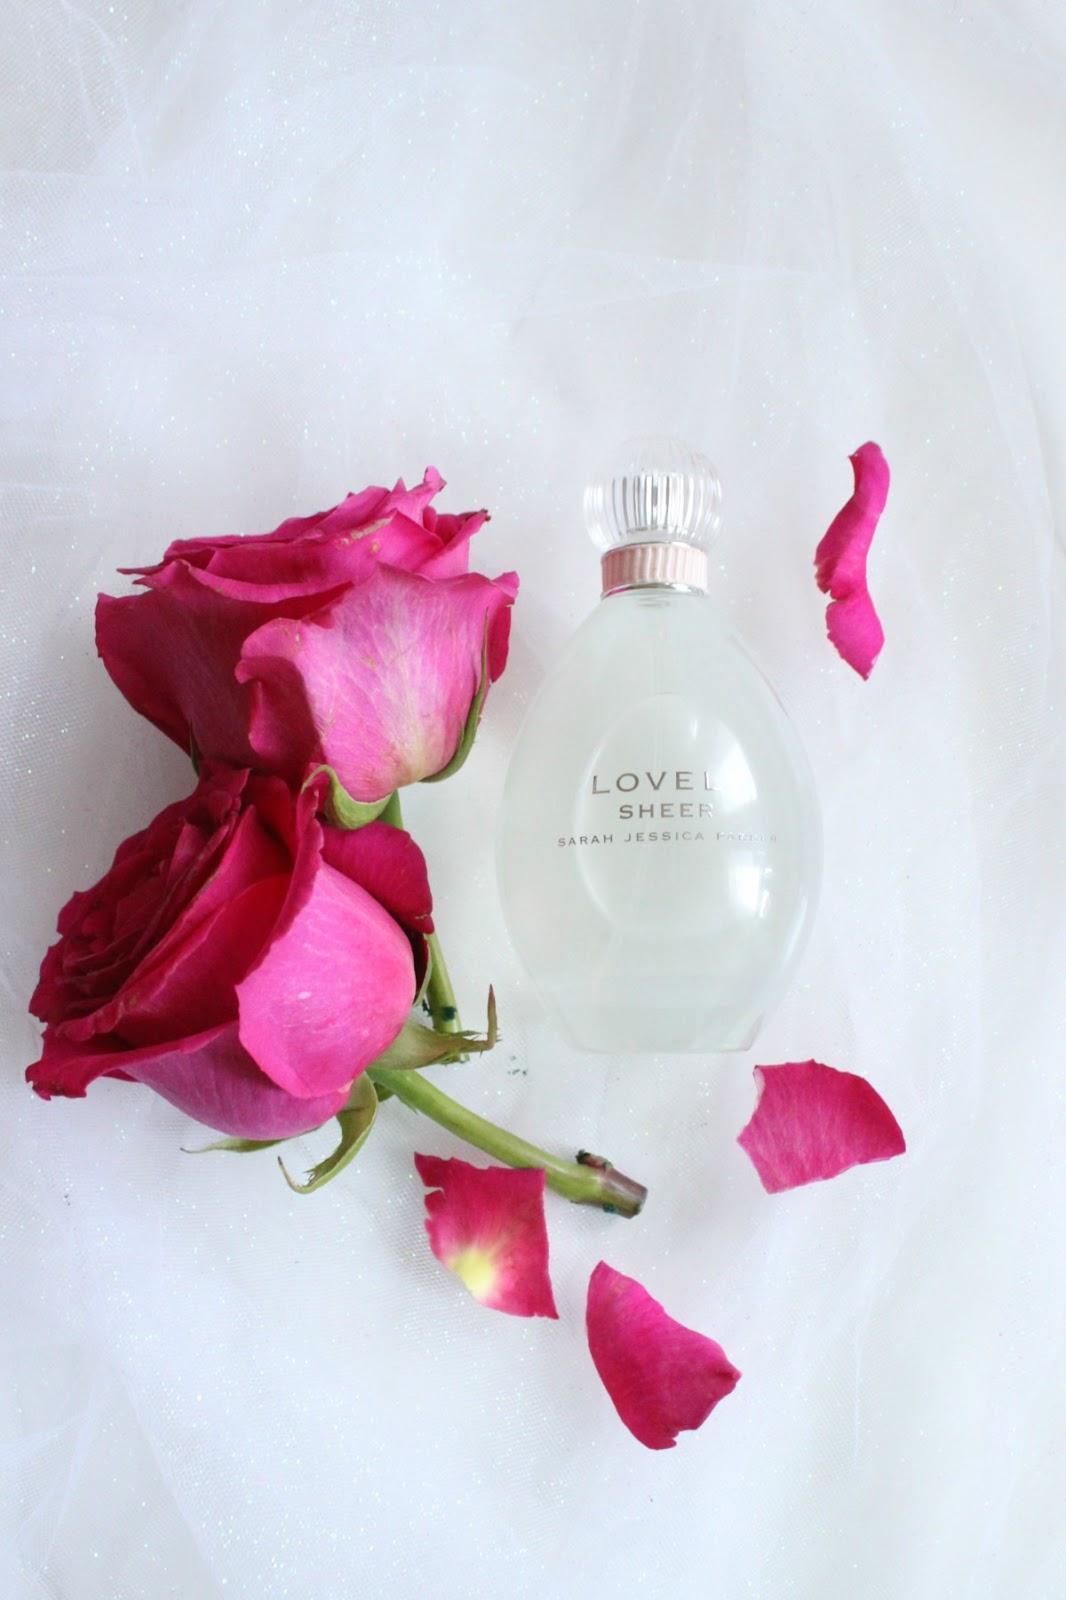 Sarah Jessica Parker Lovely Sheer Eau de Parfum